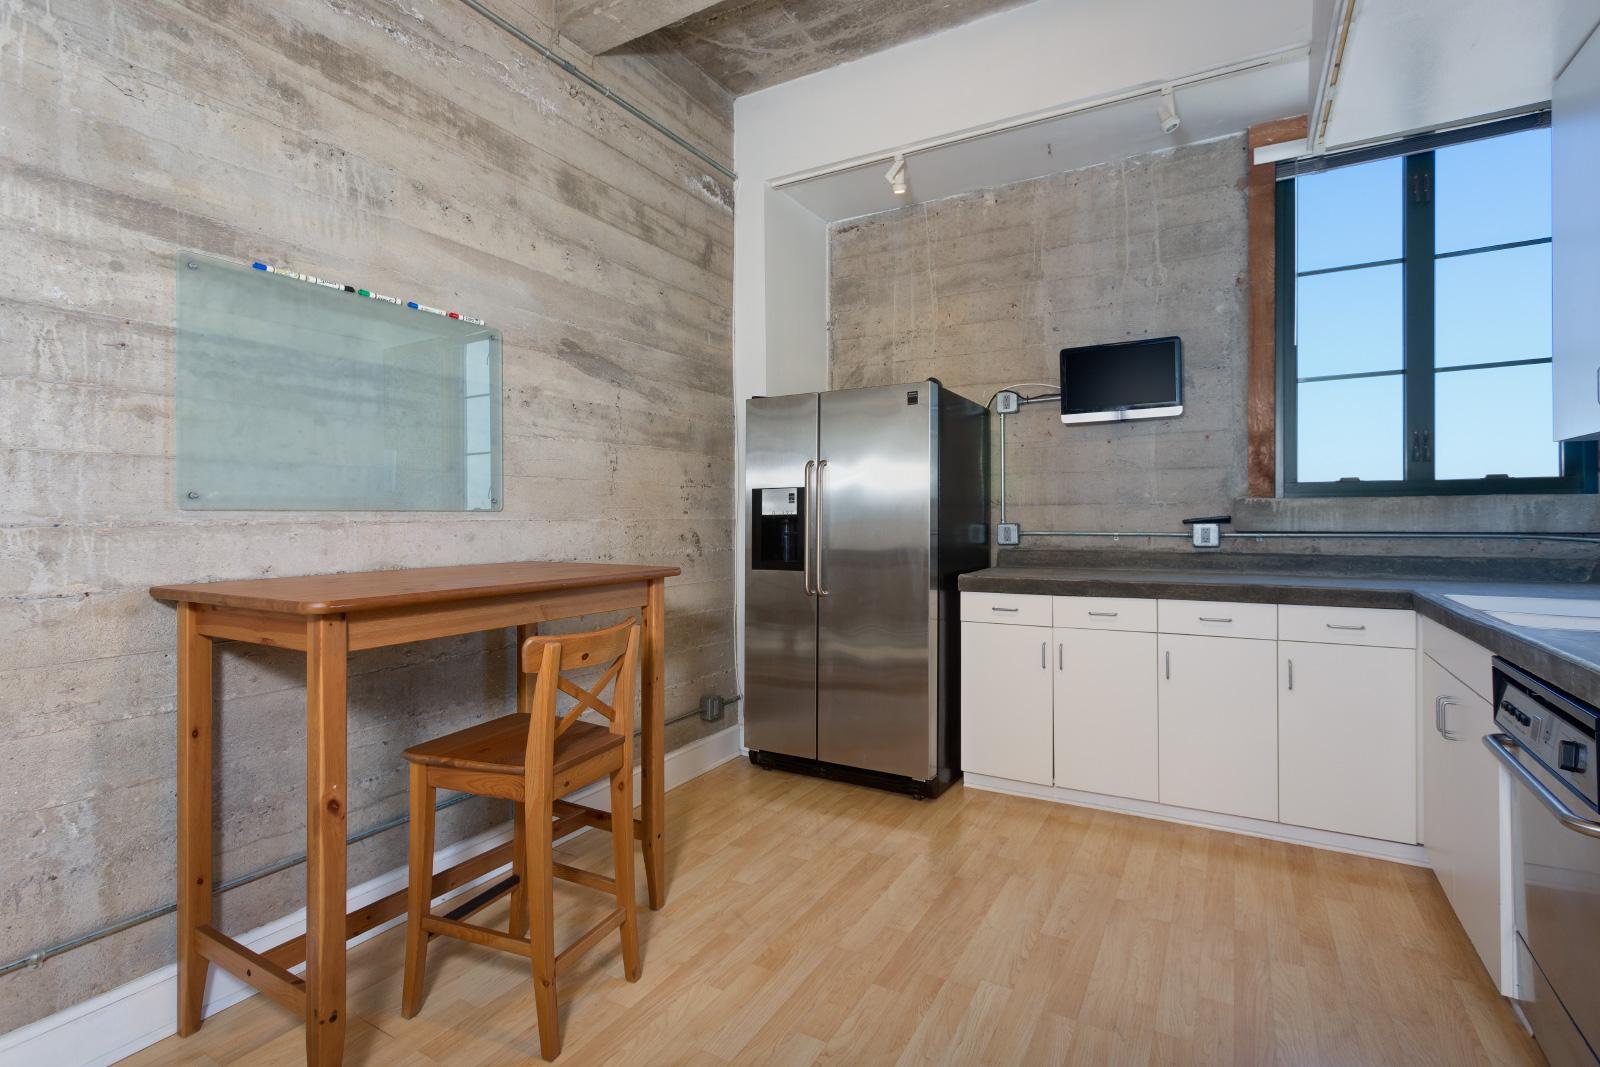 kitchen_9709493987_o.jpg